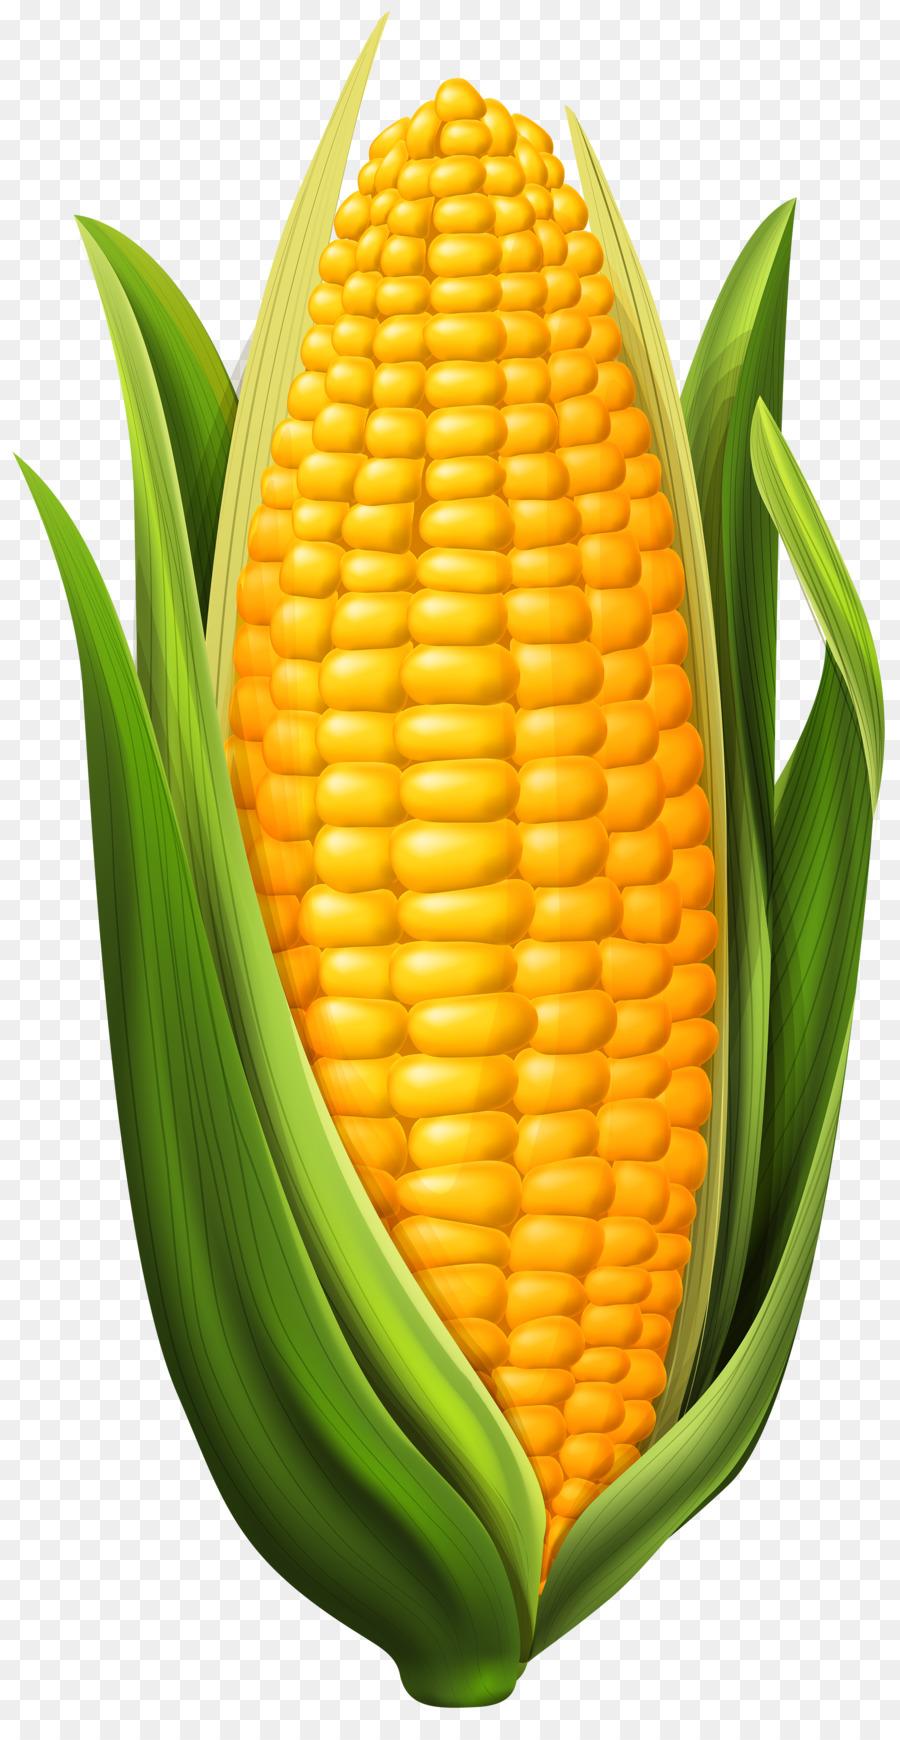 Candy corn Corn dog Maiskolben Mais Clip.